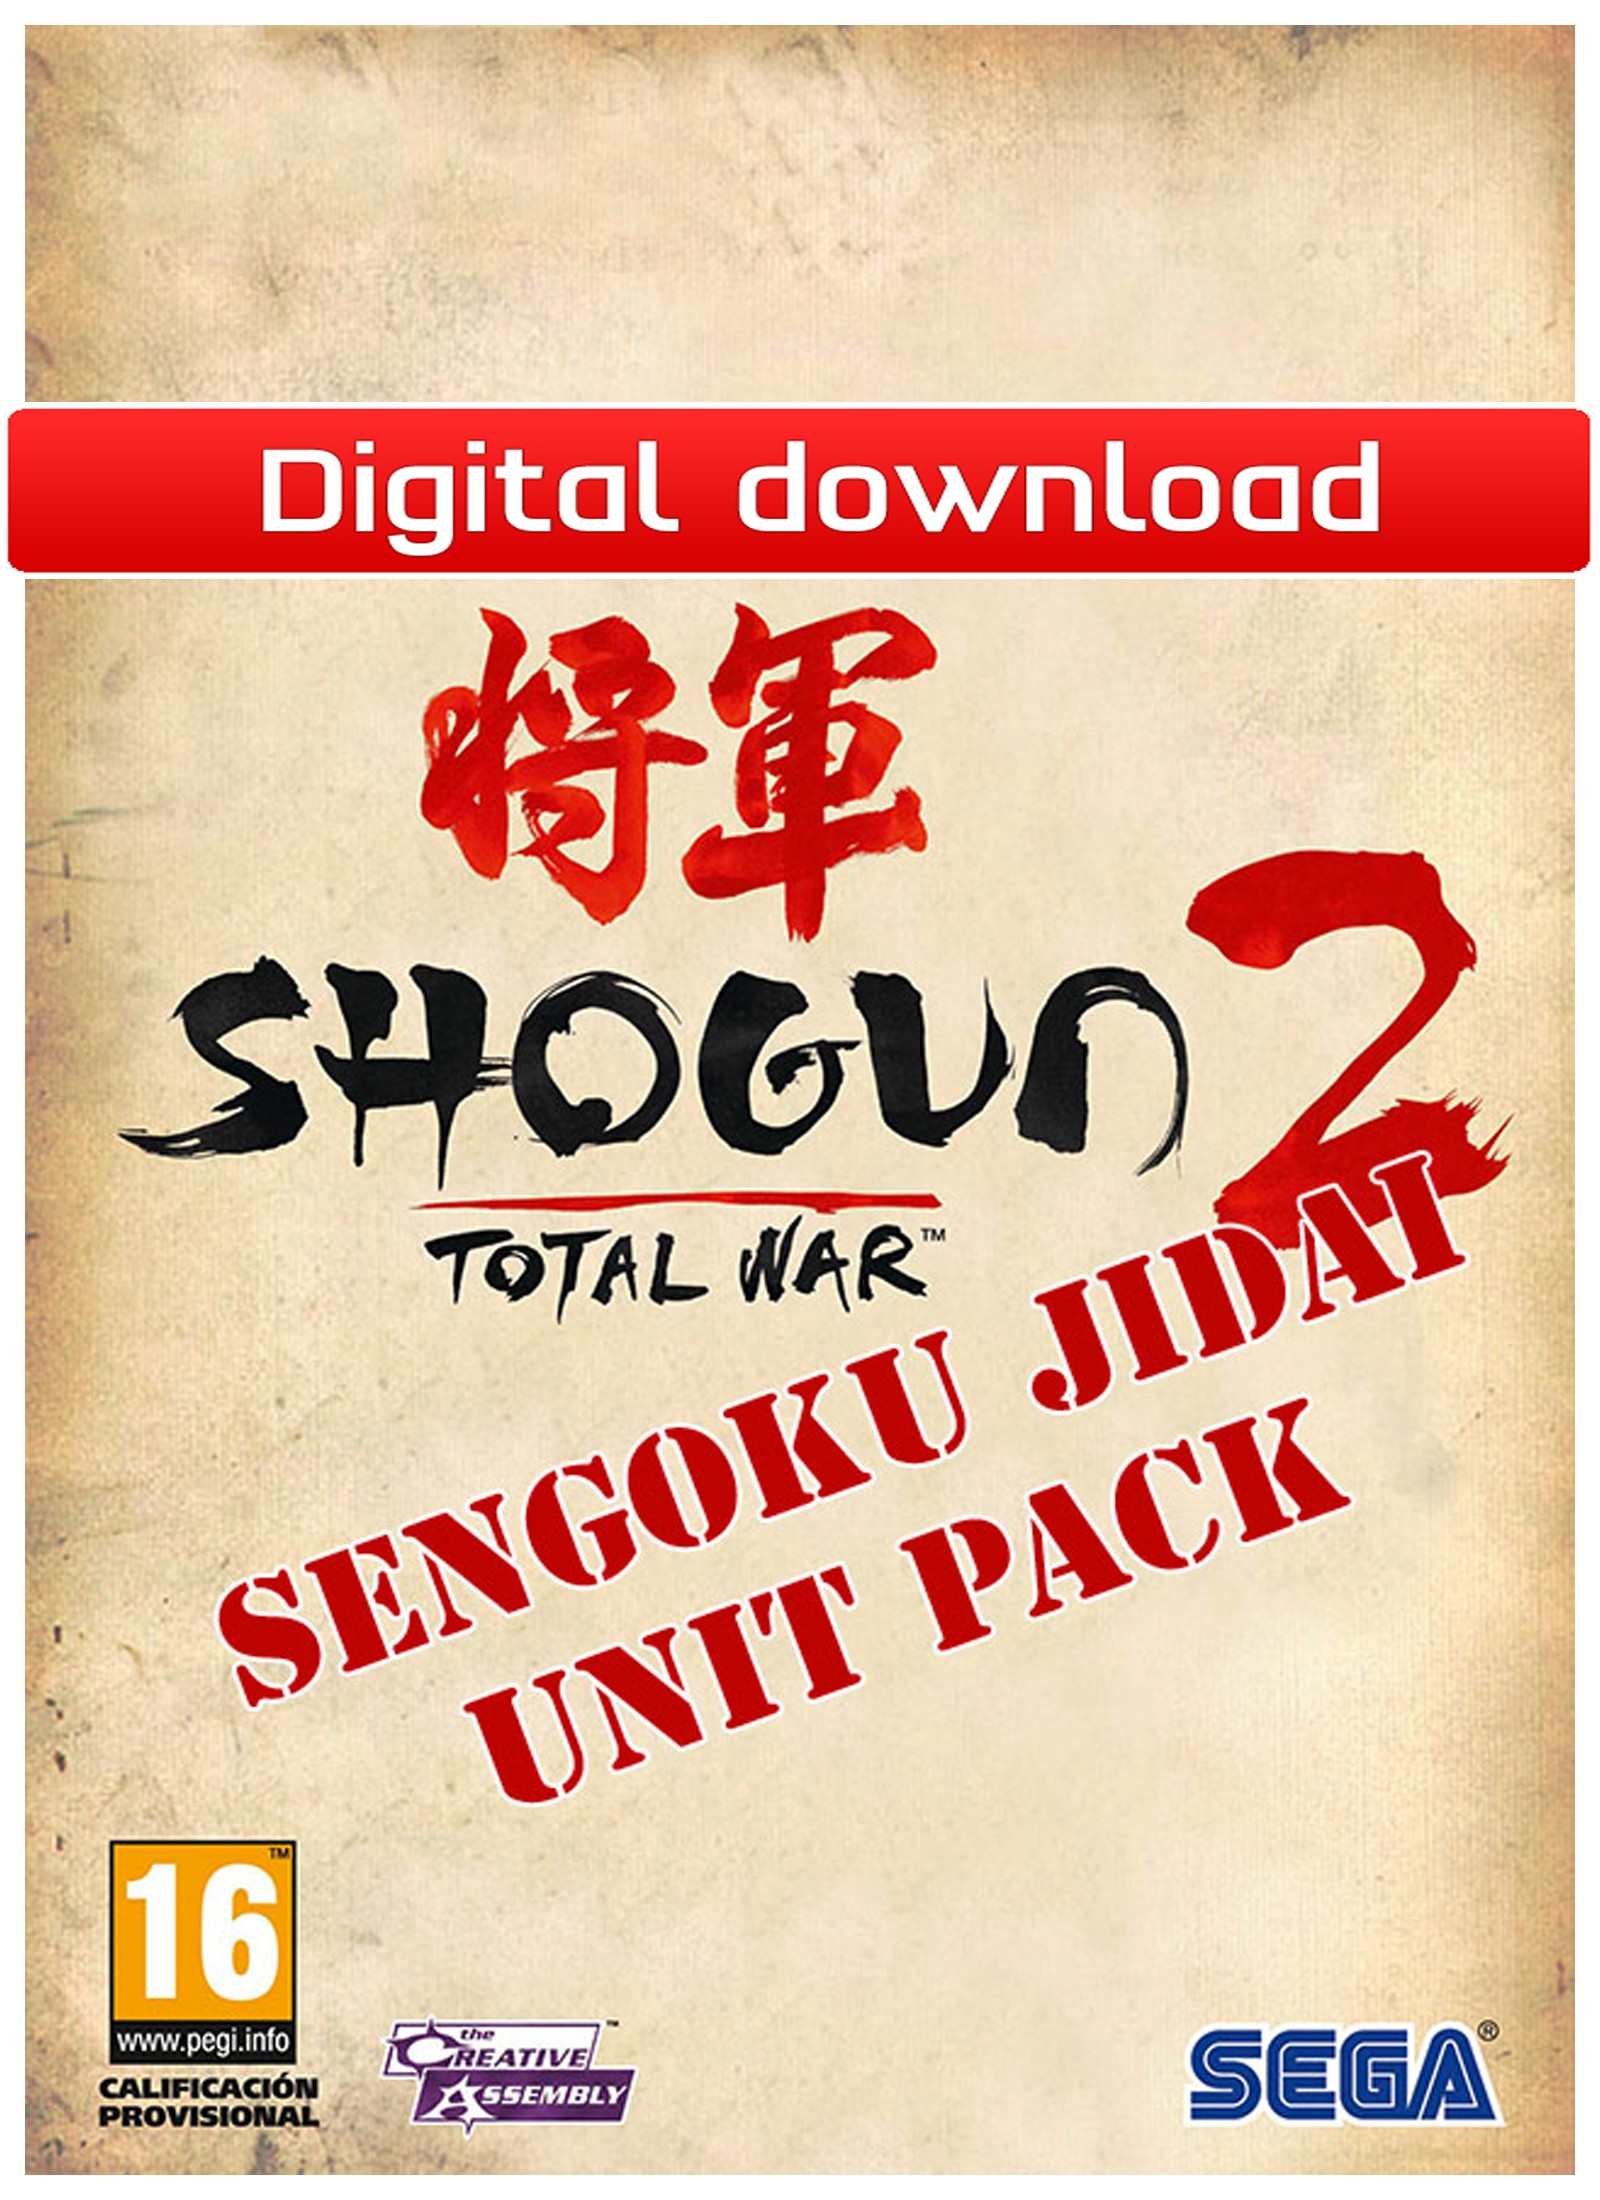 27556 : Total War: Shogun 2: Sengoku Jidai UP(PC nedlastning)